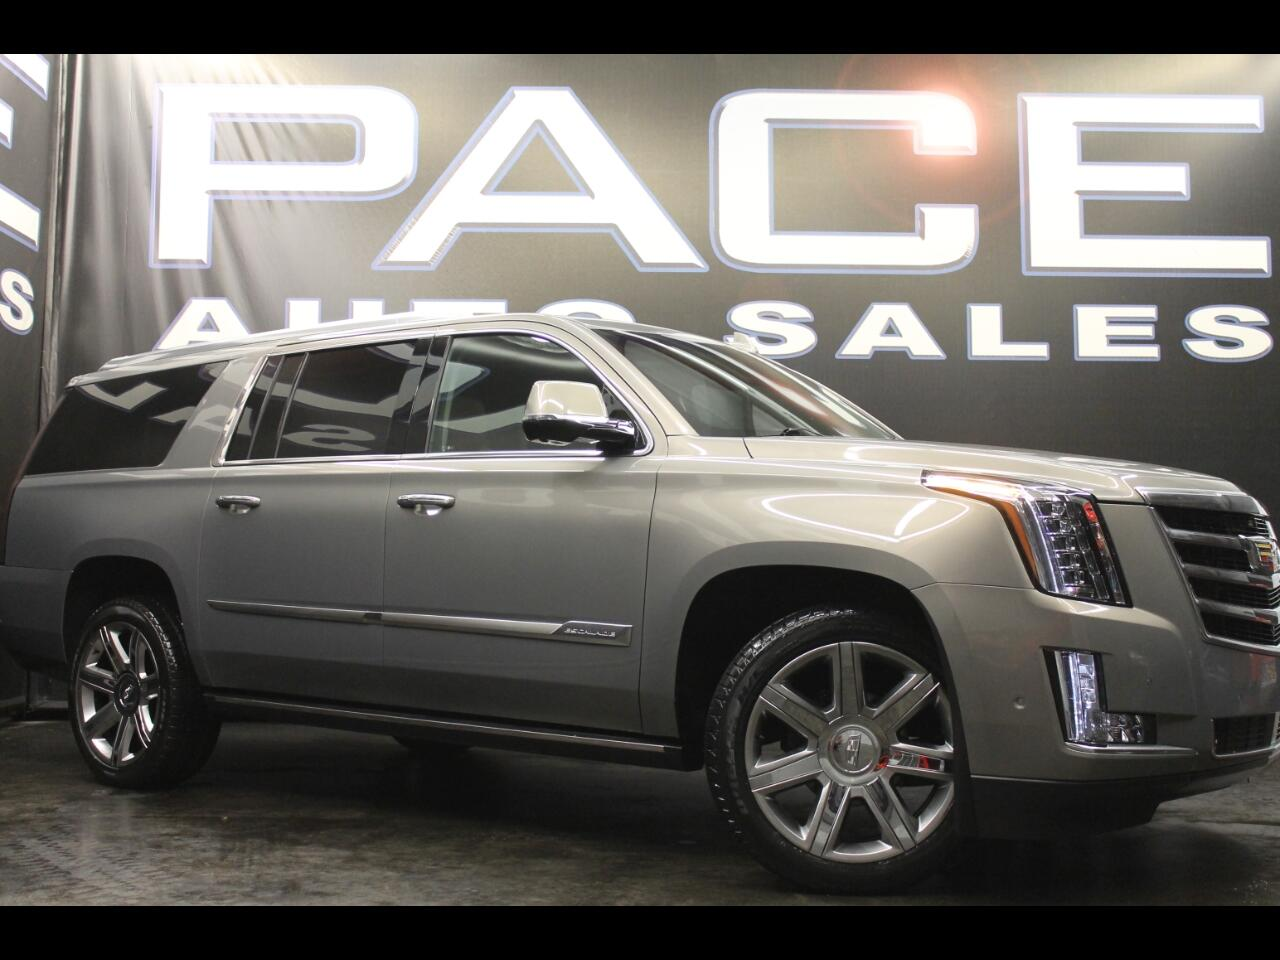 2017 Cadillac Escalade ESV 2WD 4dr Premium Luxury